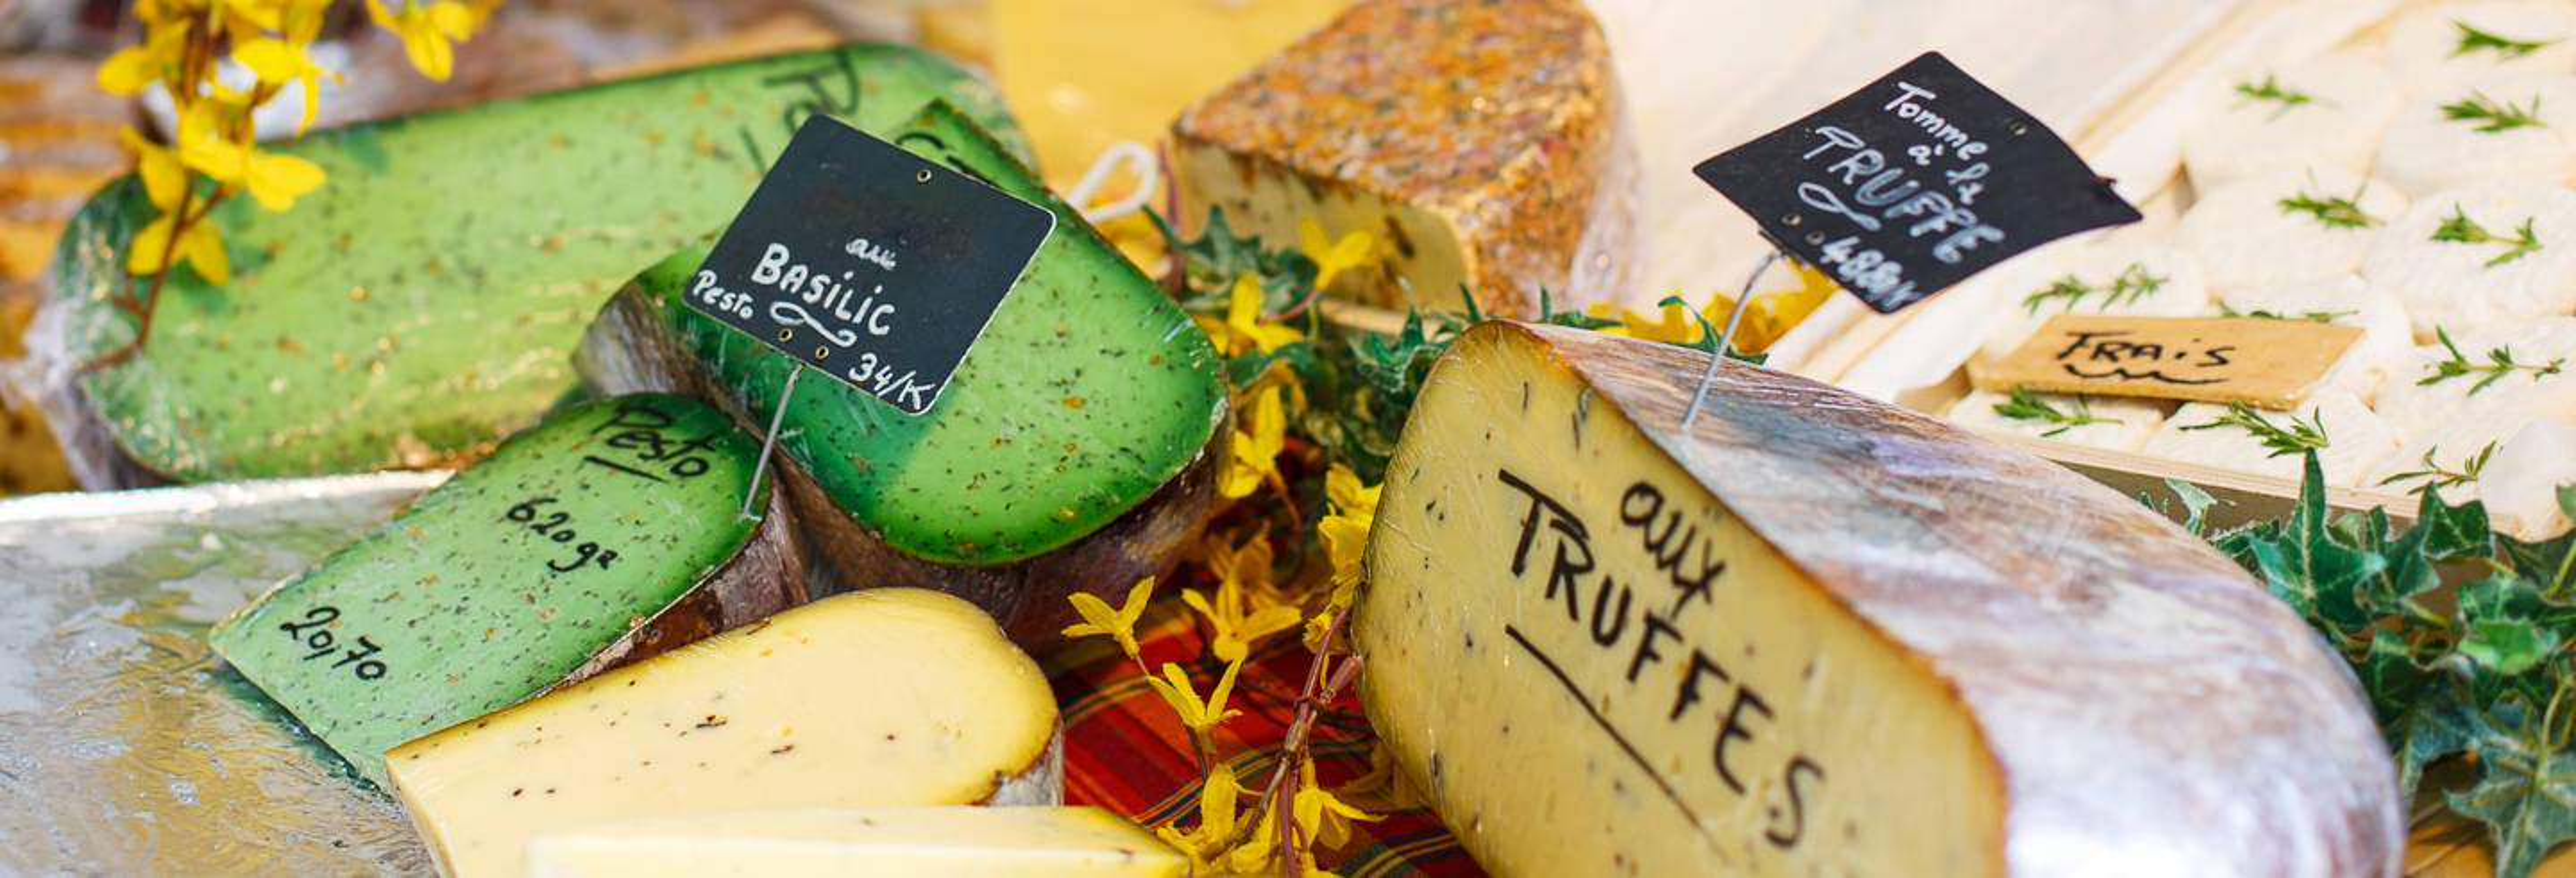 Tour gastronômico pelo mercado de Estrasburgo